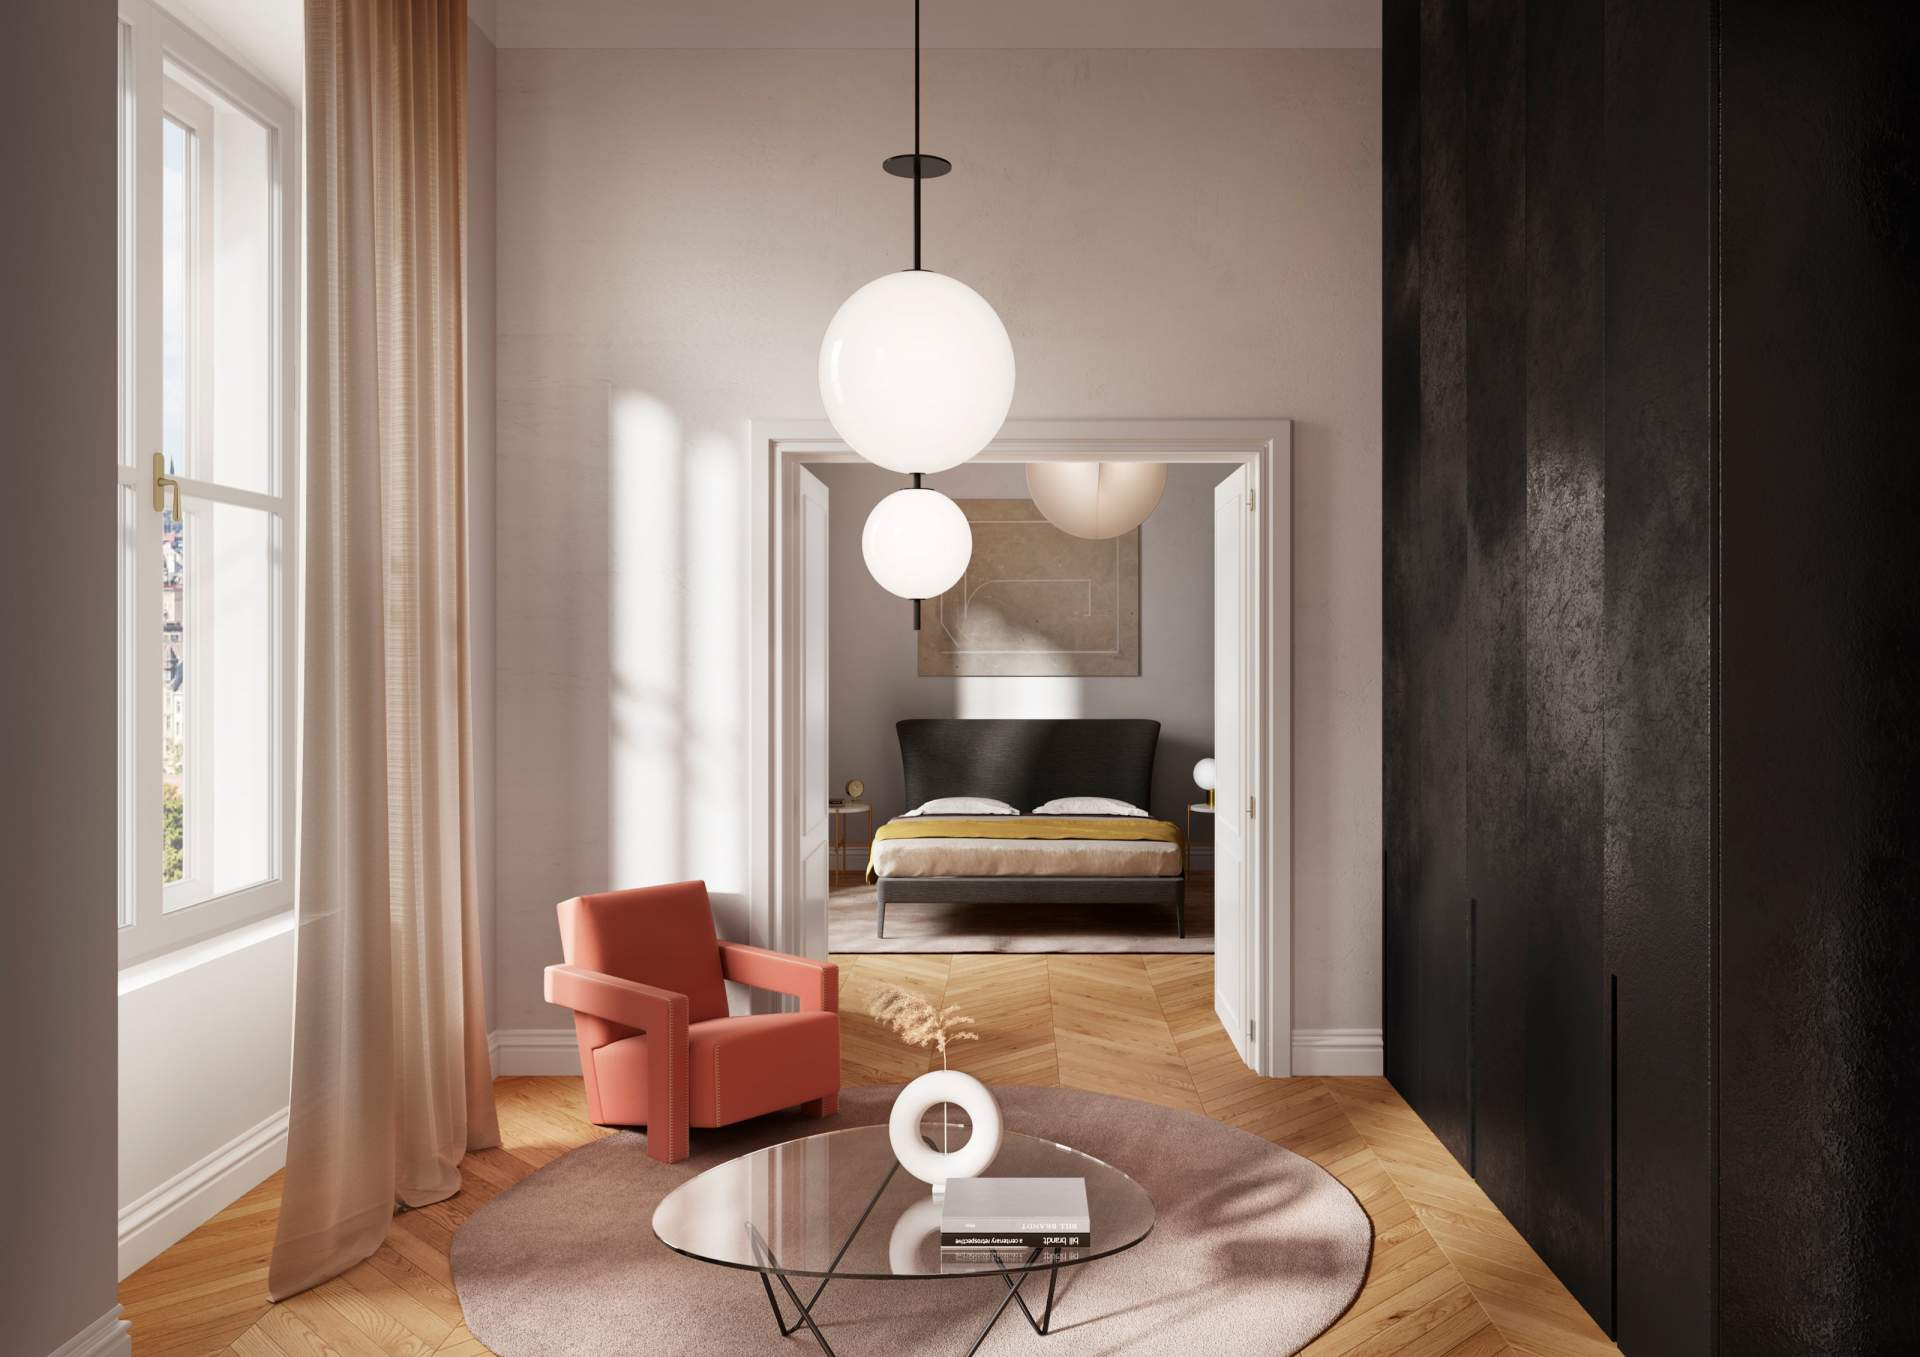 Apartment 401 - Bedroom